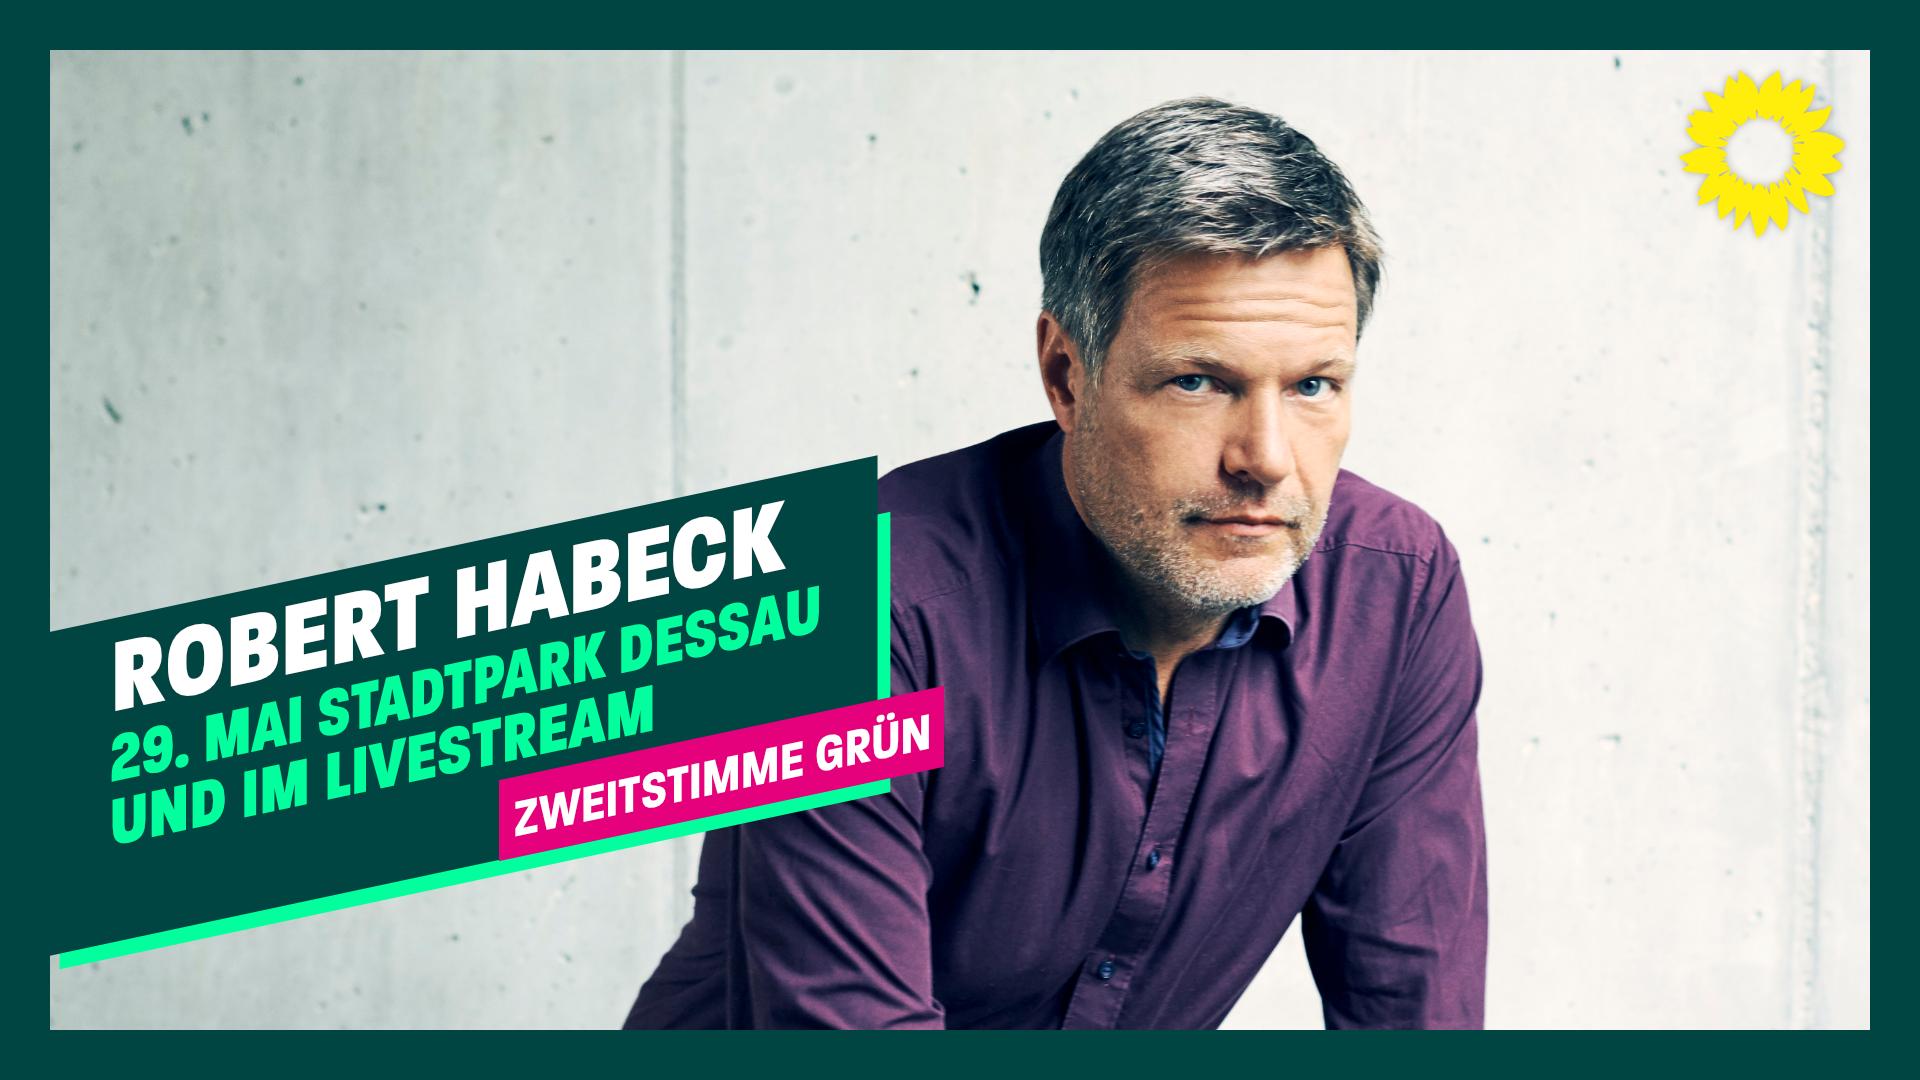 Robert Habeck am 29. Mai in Wittenberg und Dessau-Roßlau